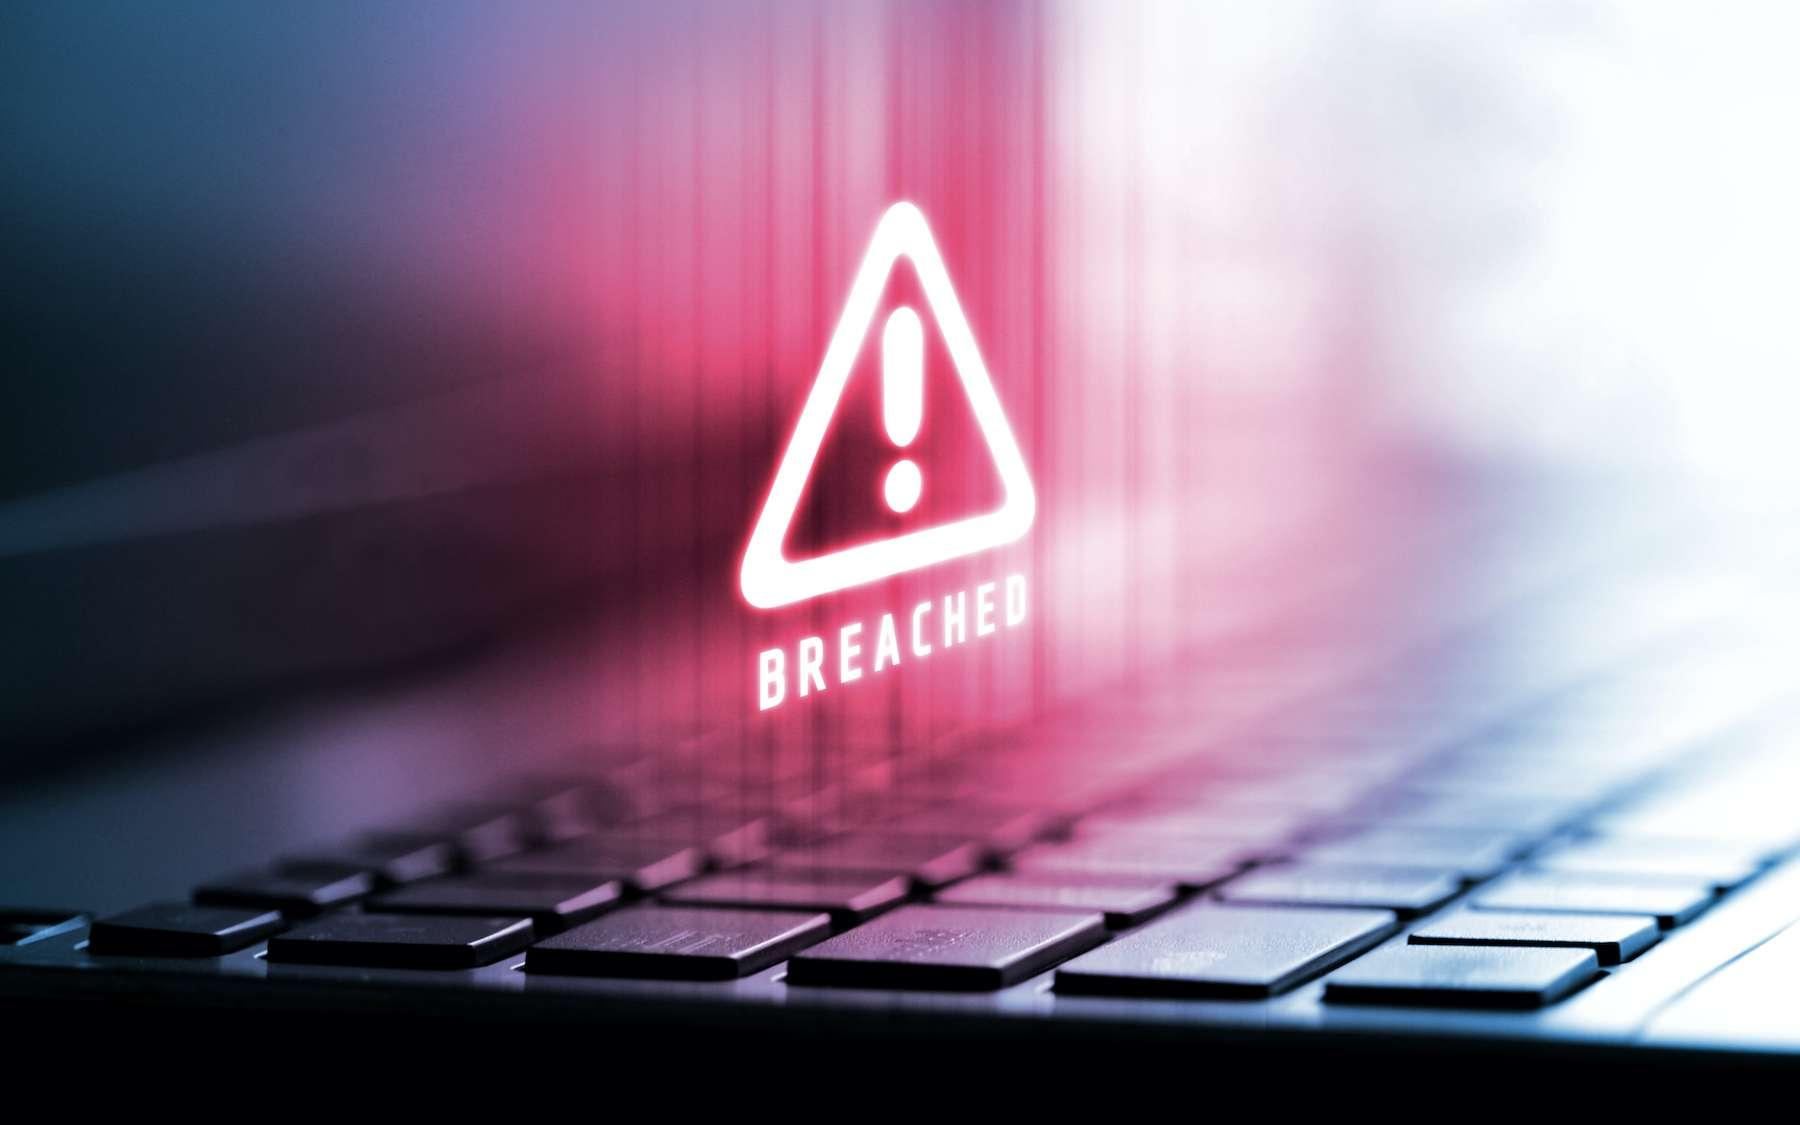 Les cyberattaques peuvent cibler n'importe quel particulier ou organisation. © knssr, Adobe Stock